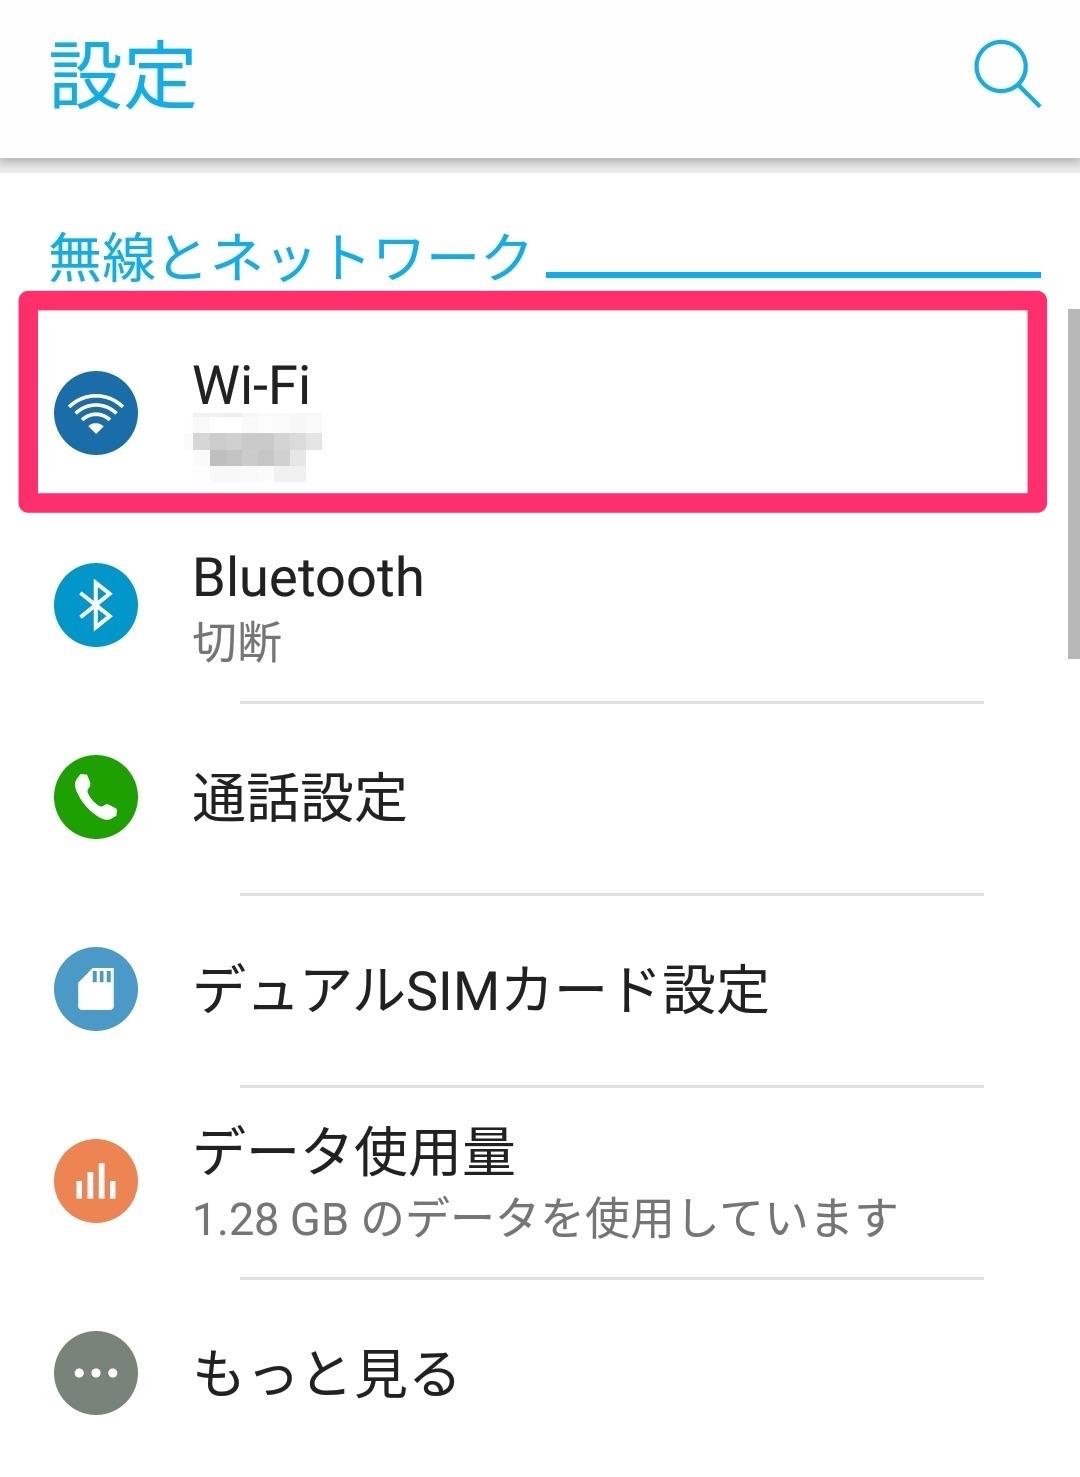 Wi-Fiを選ぶ